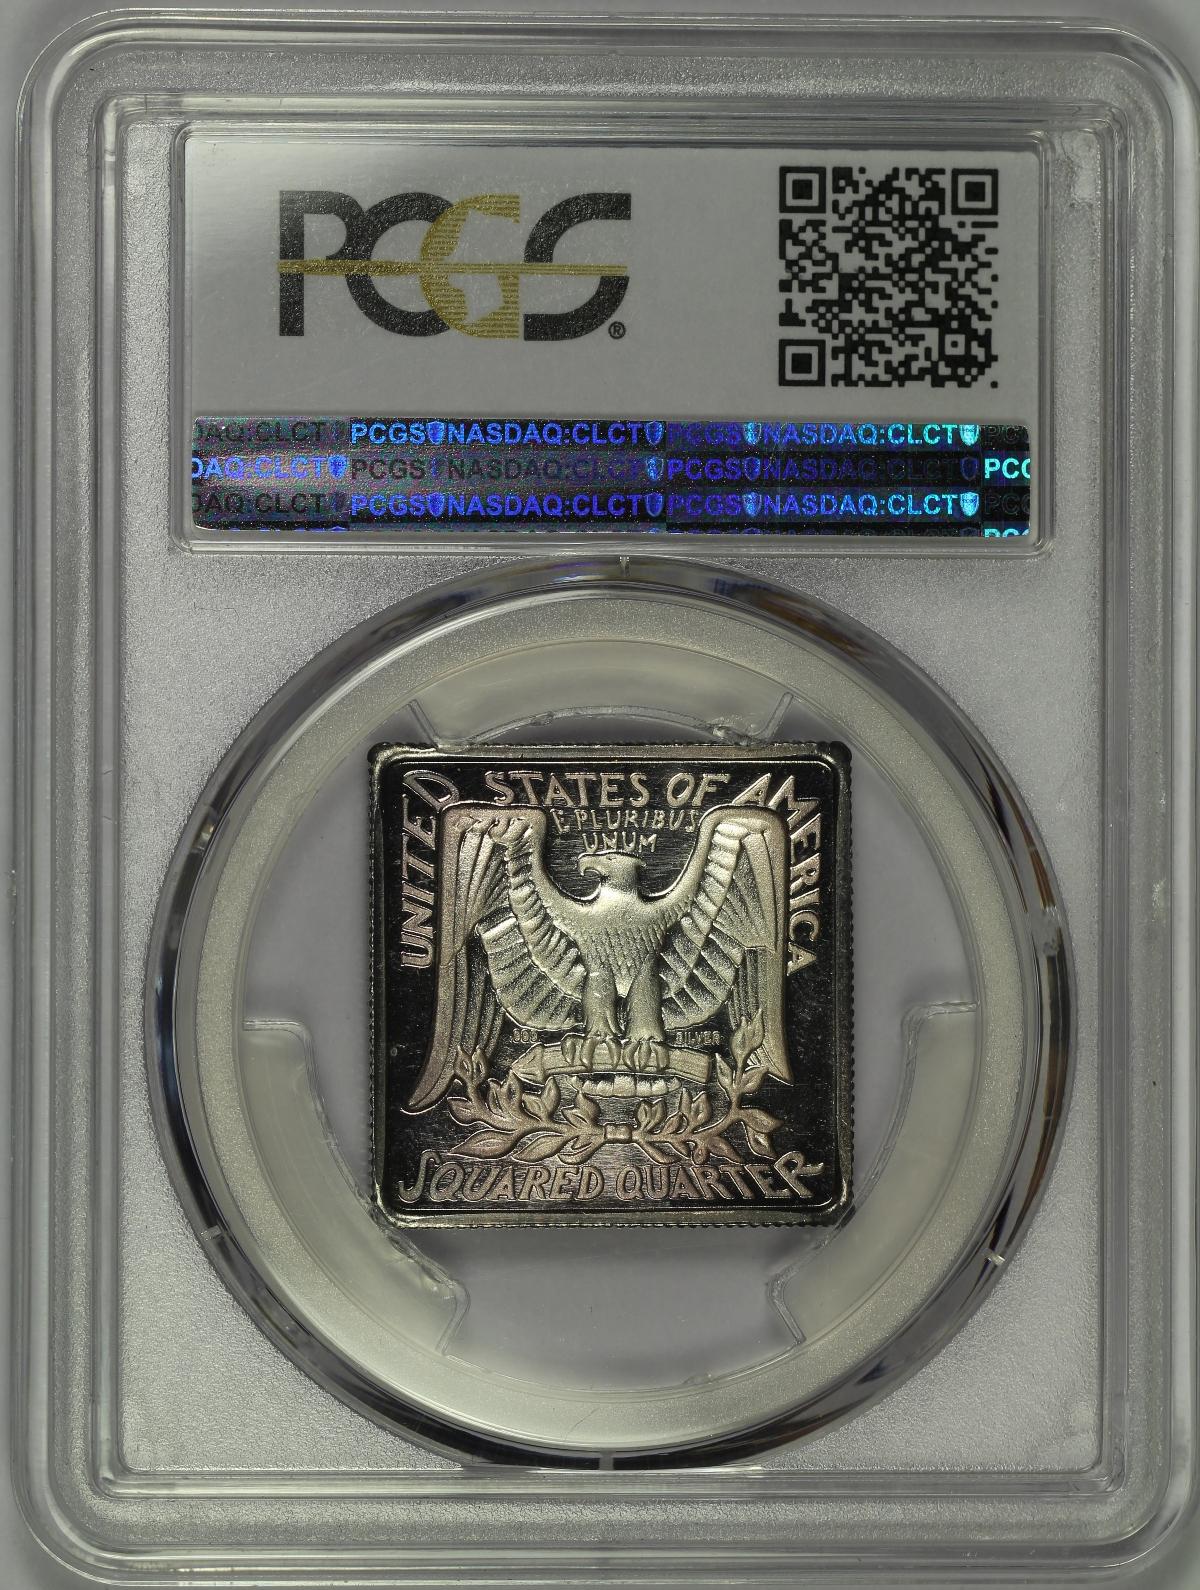 Michael Kittle Rare Coins 1984 Squared Quarter 1 2 Oz